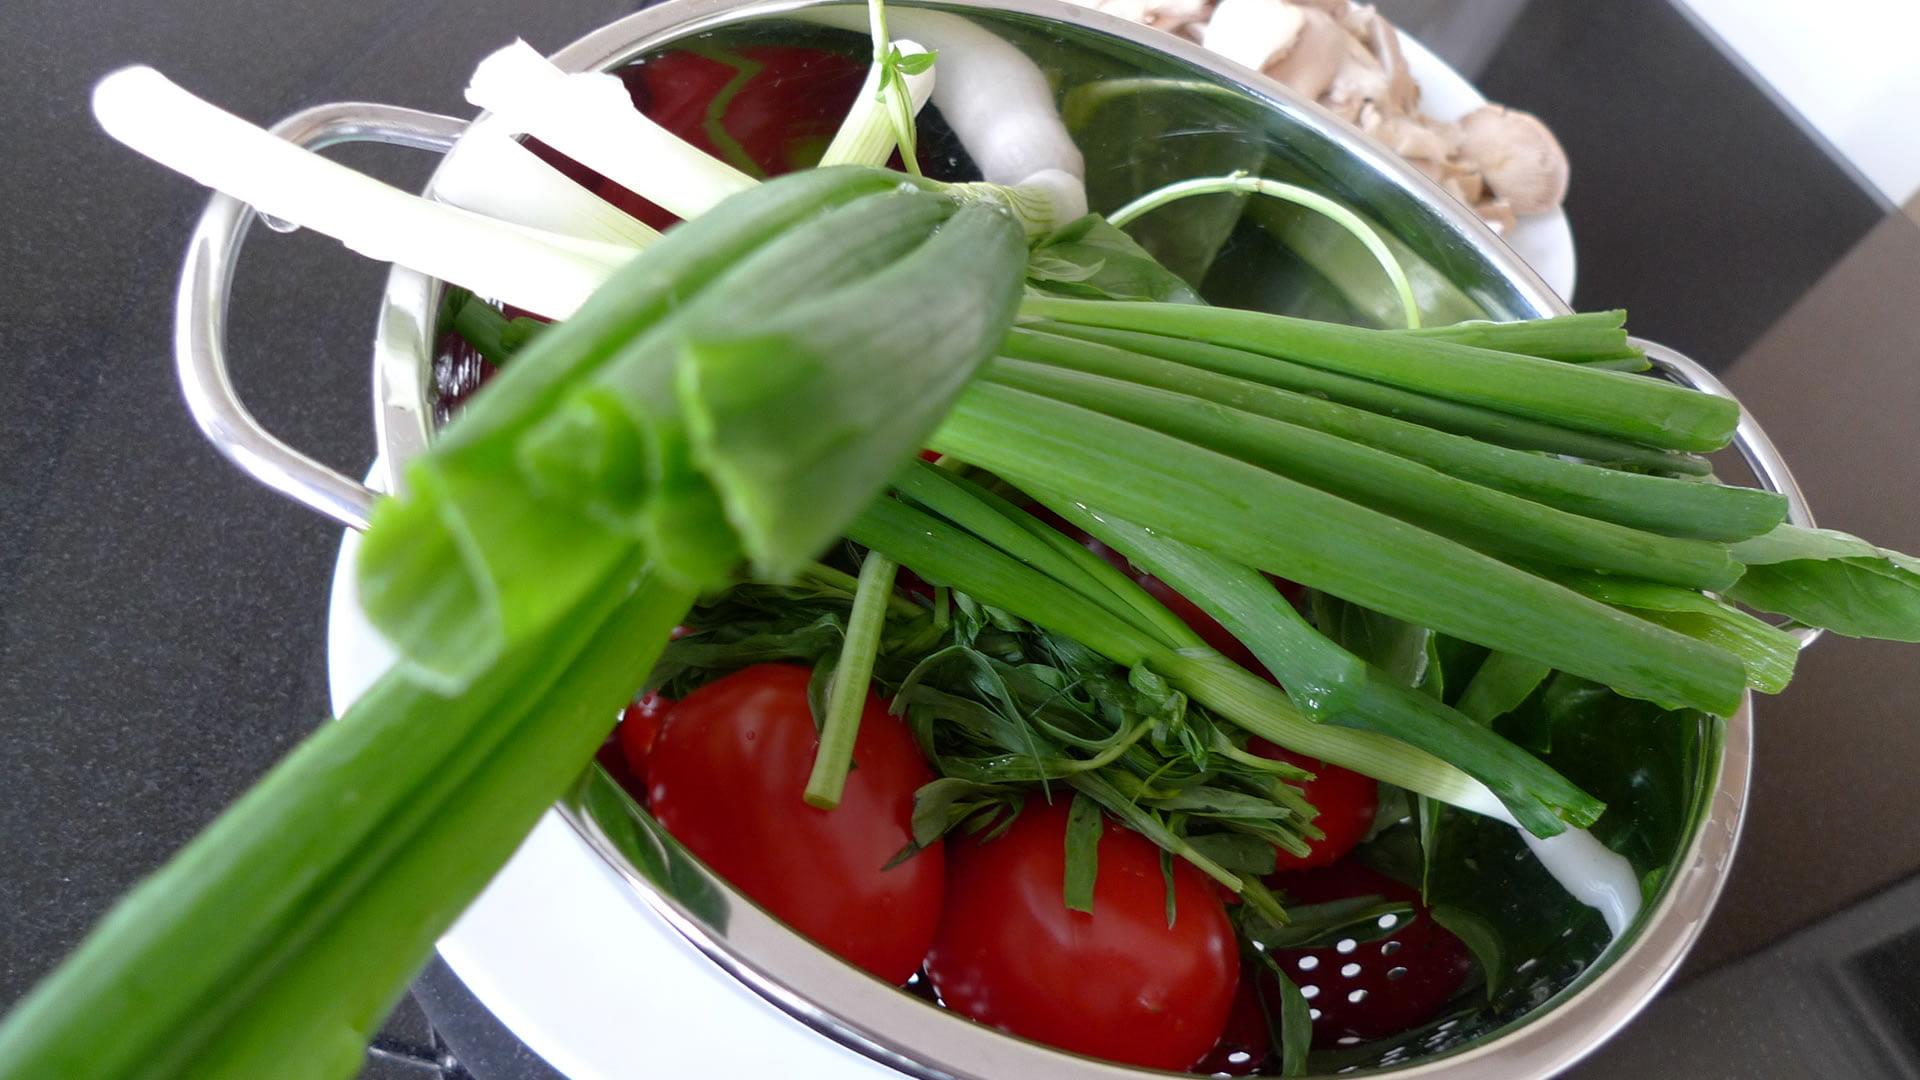 Ingredientes para preparar fasolada